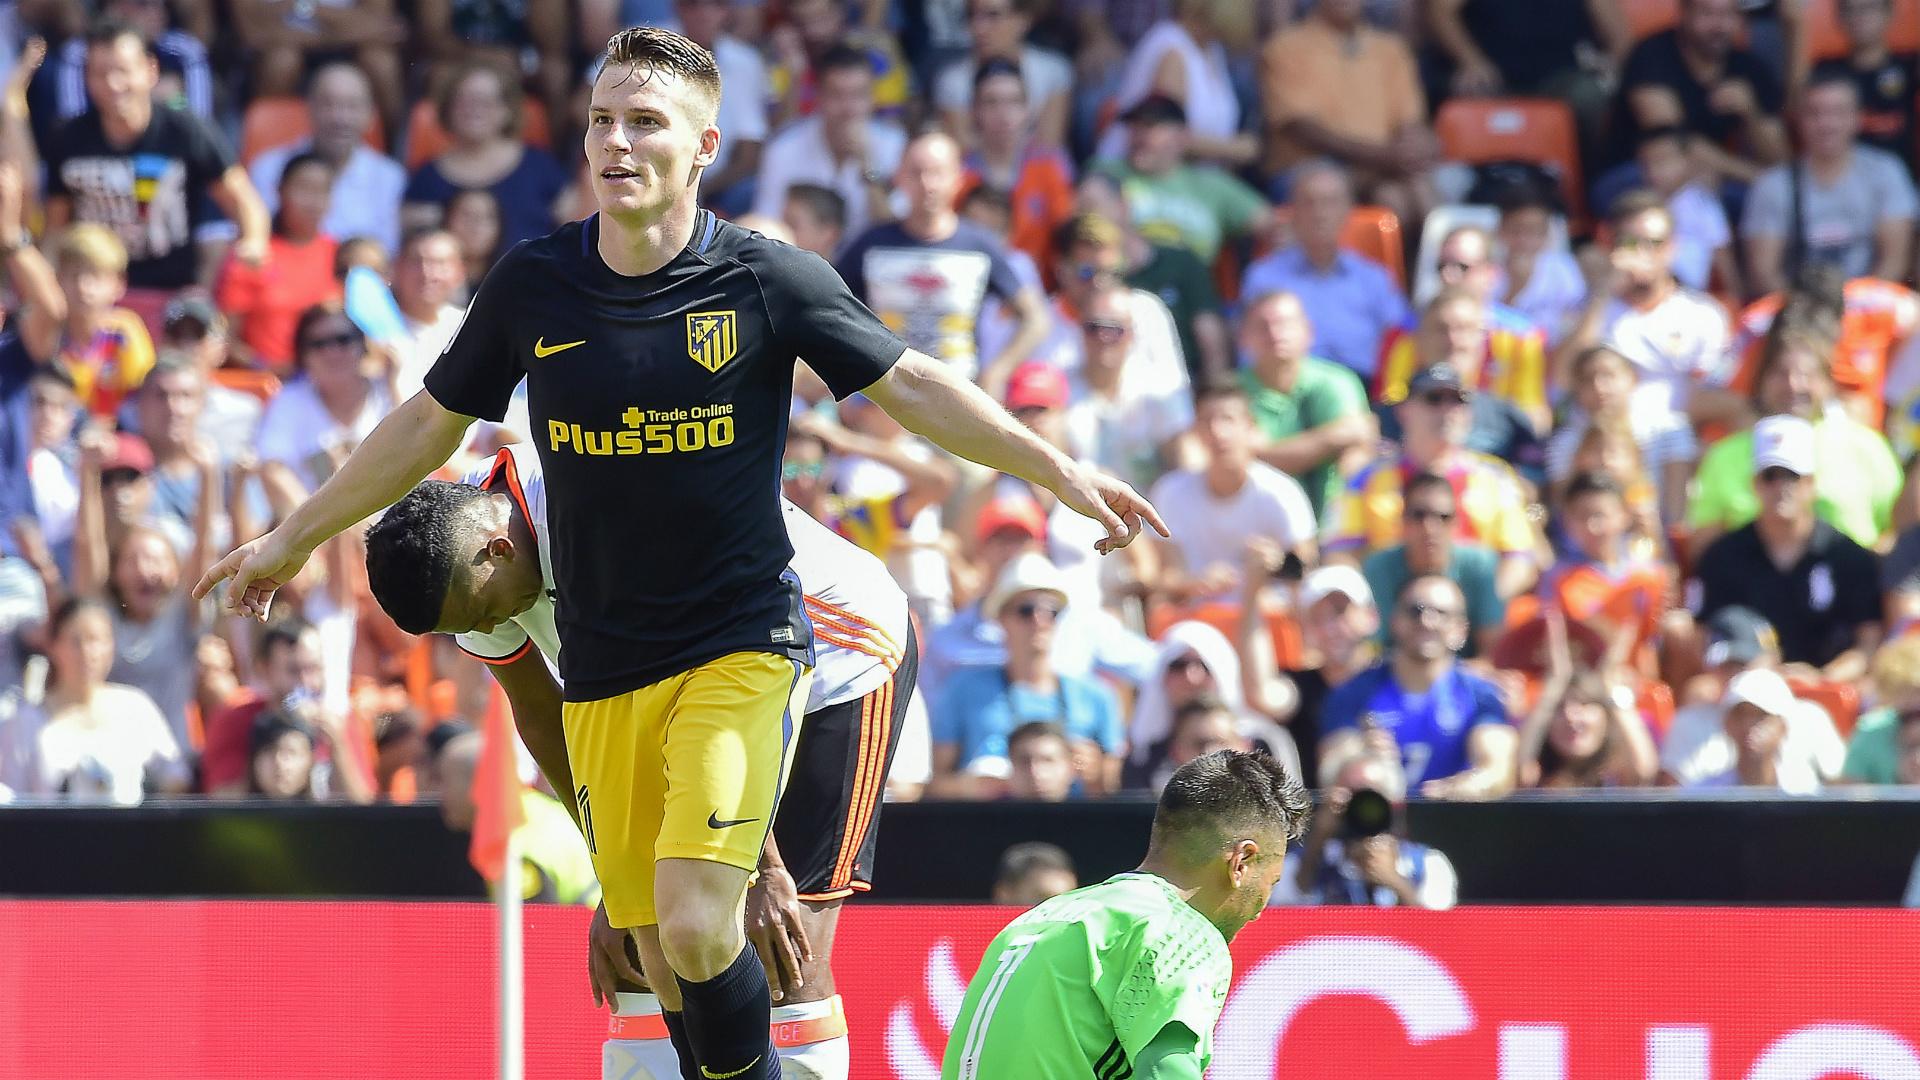 Sube Atlético de Madrid a la cima